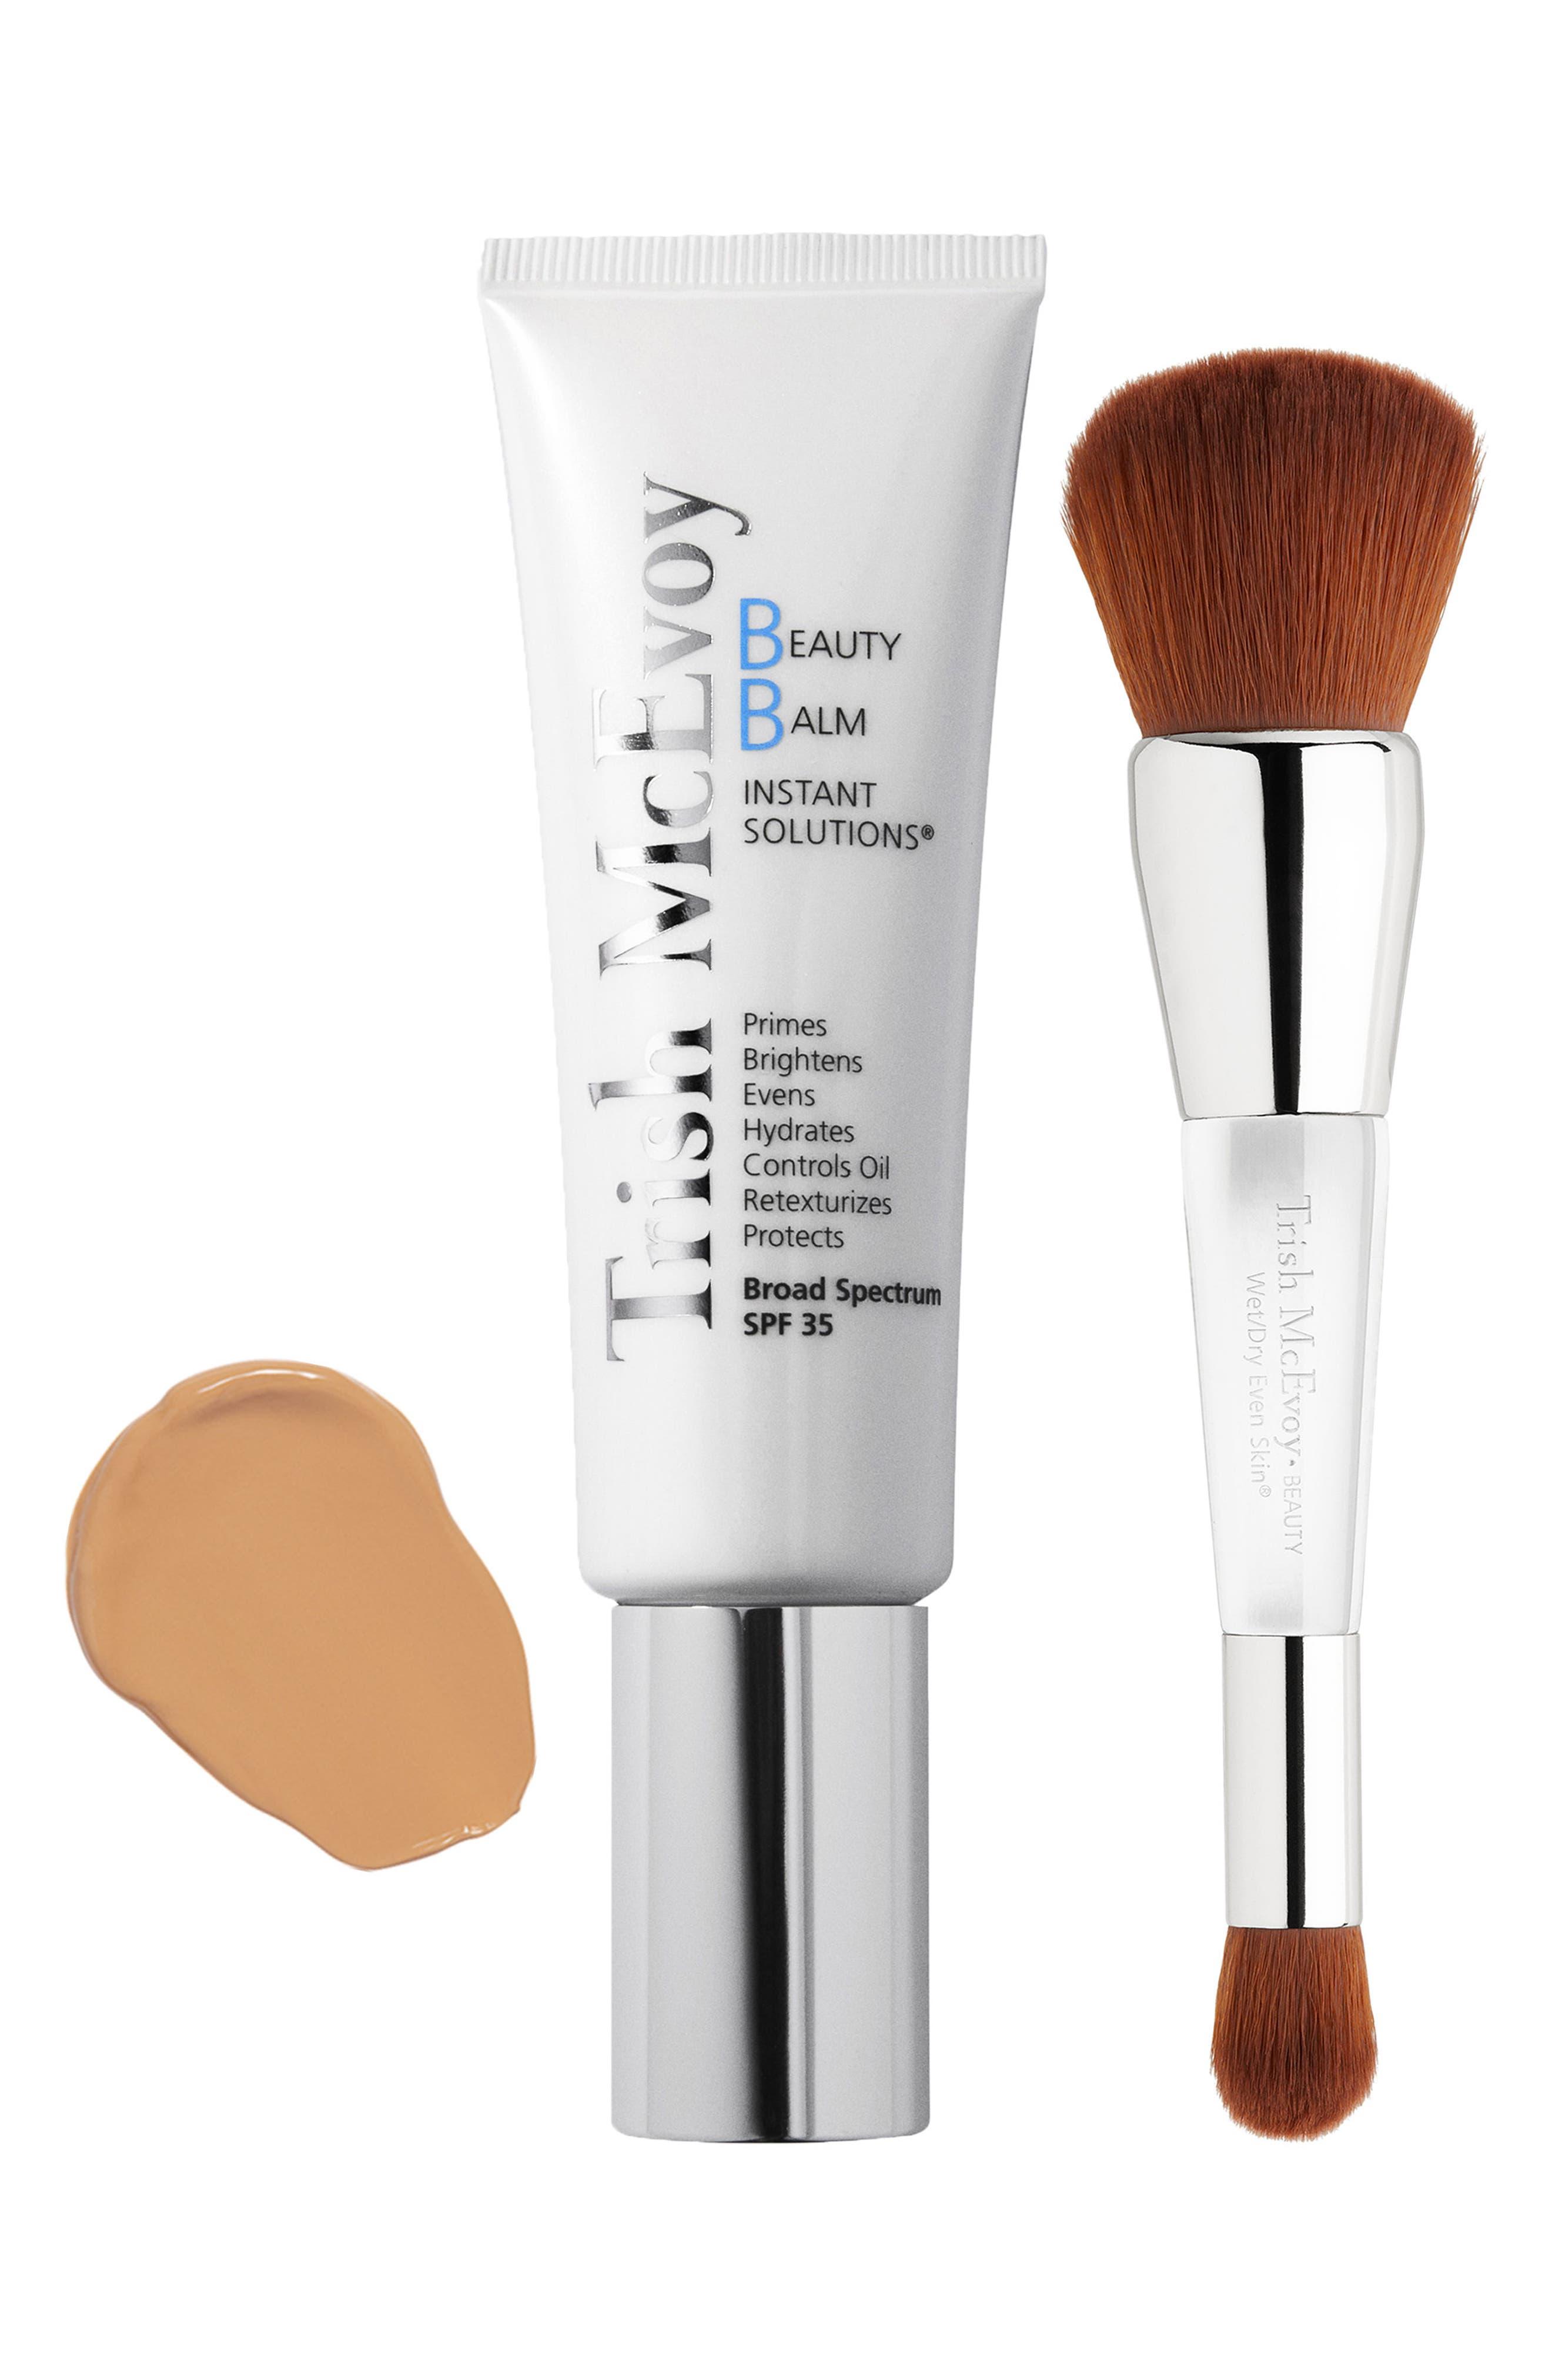 Beauty Balm & Wet/Dry Brush Set,                             Main thumbnail 1, color,                             200